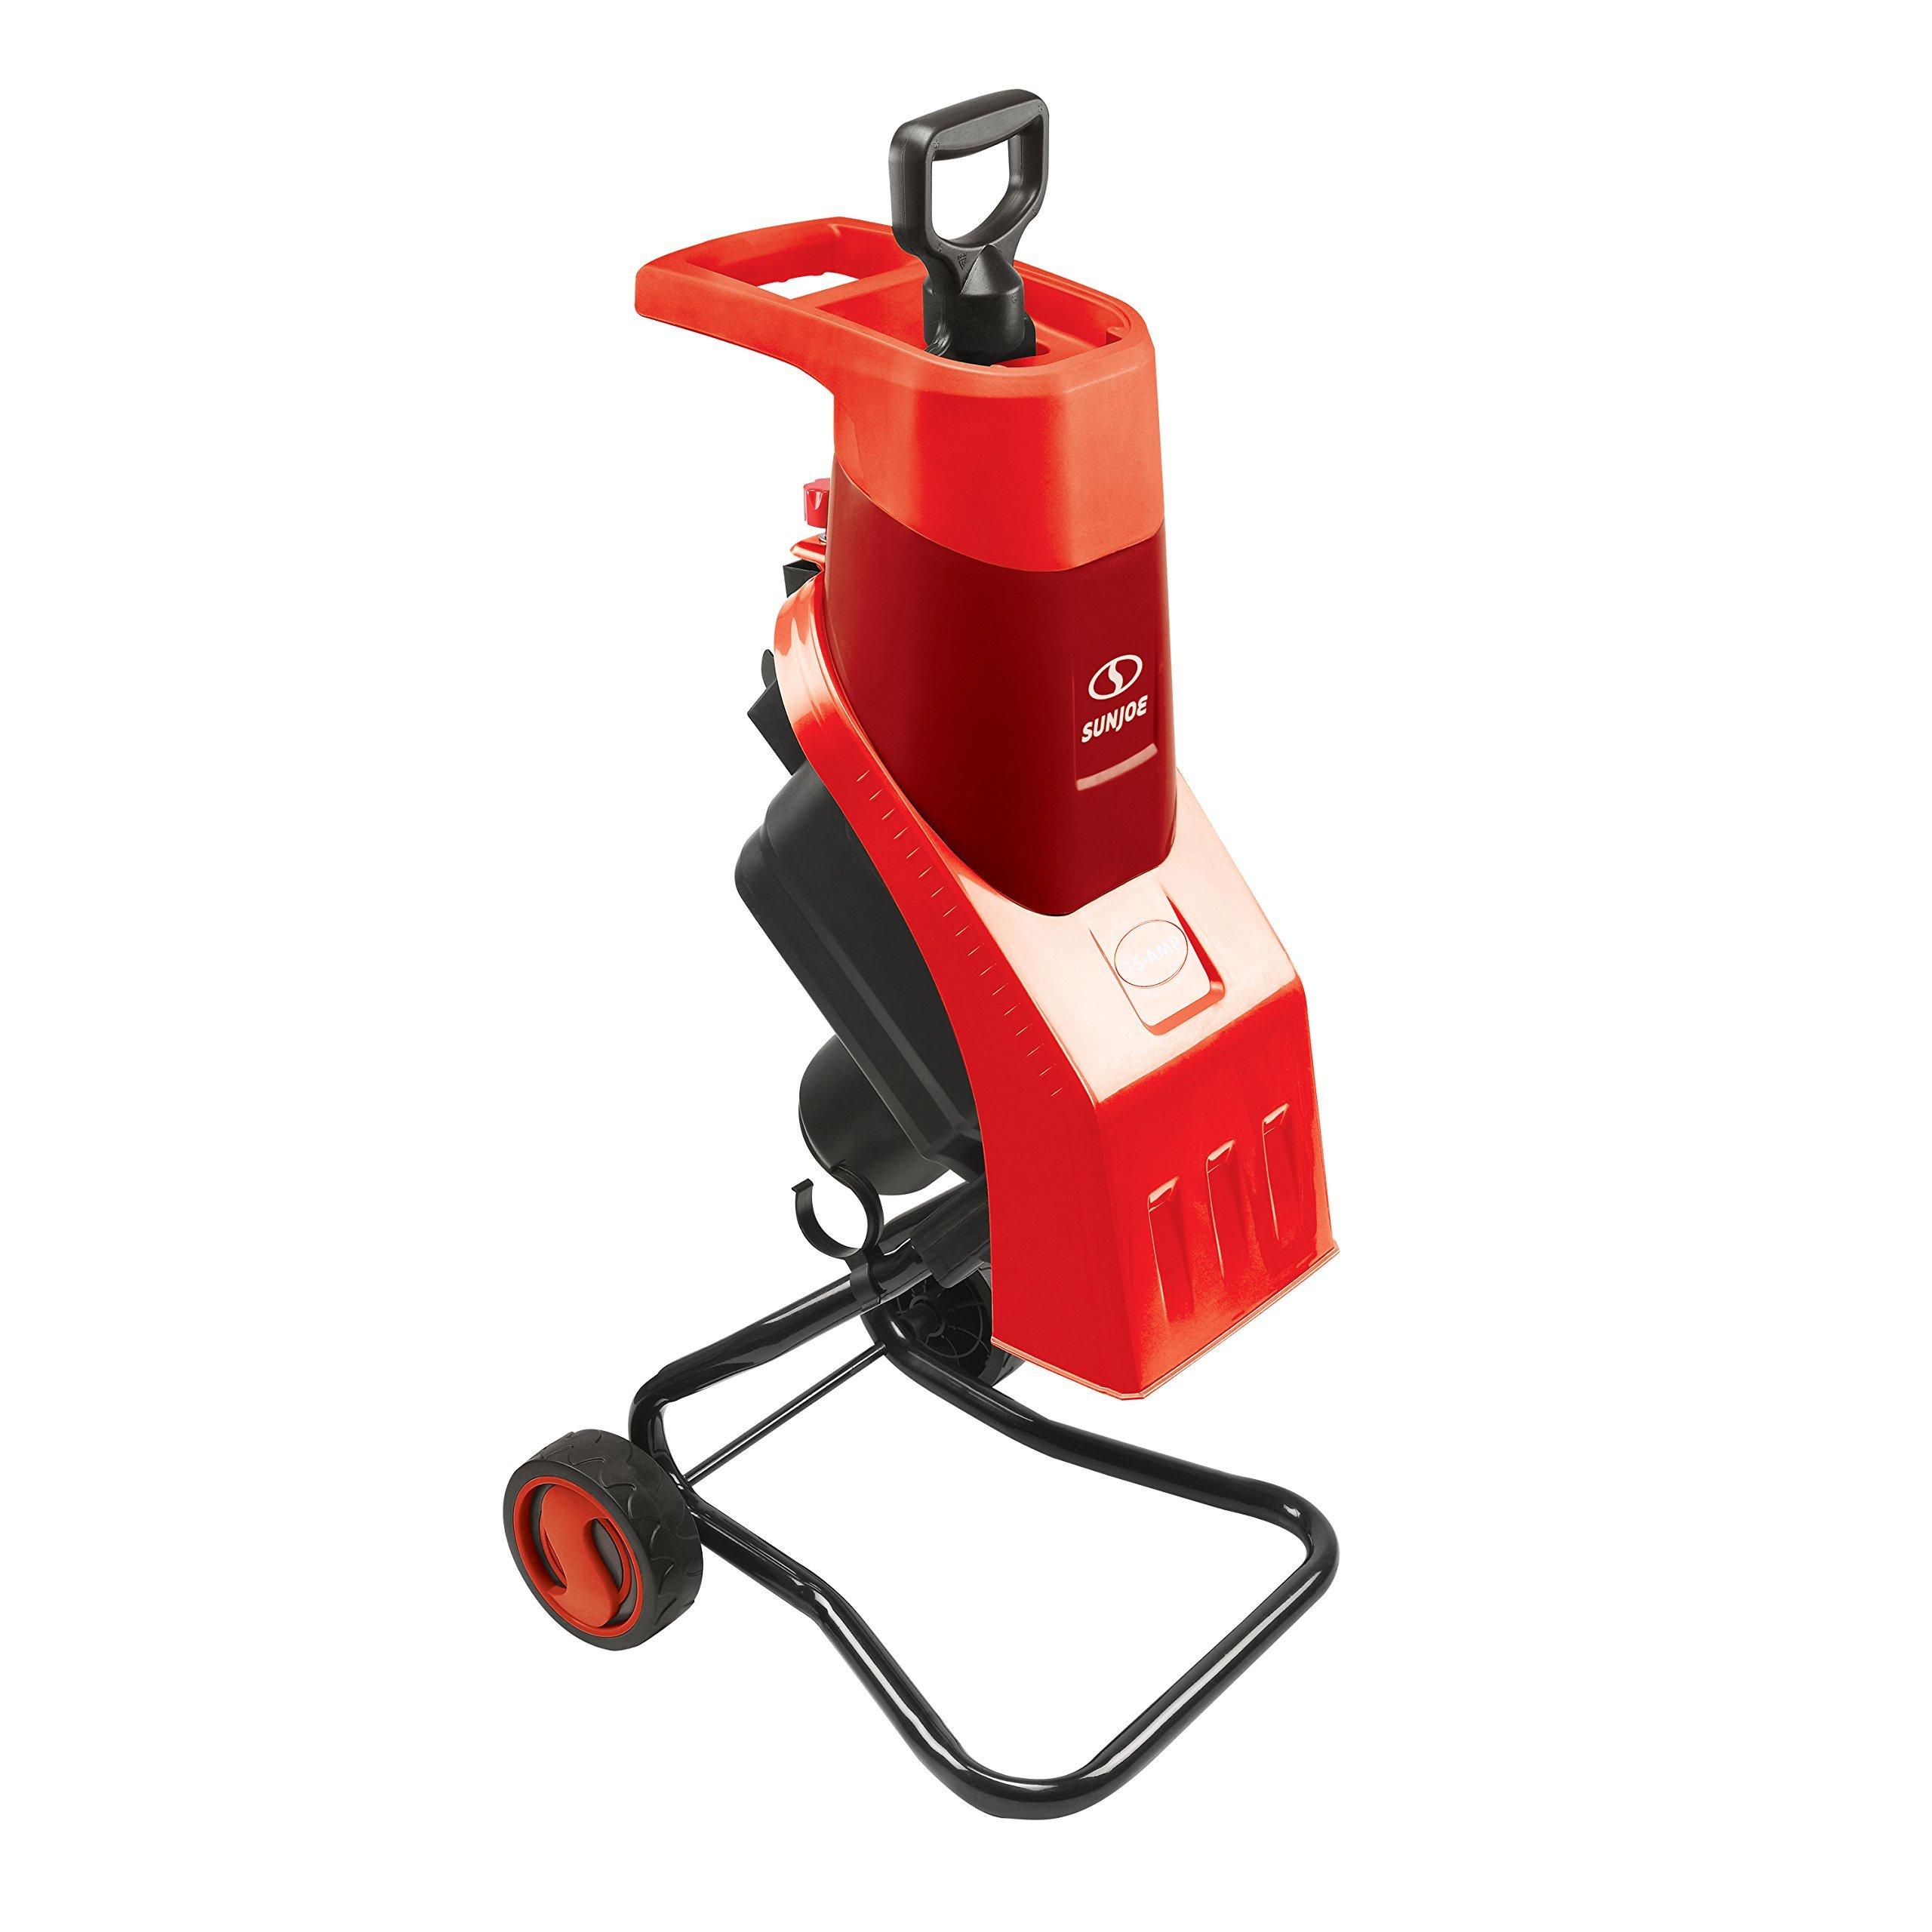 Sun Joe CJ602E-RED 15 Amp Electric Wood Chipper/Shredder, Red (Renewed)